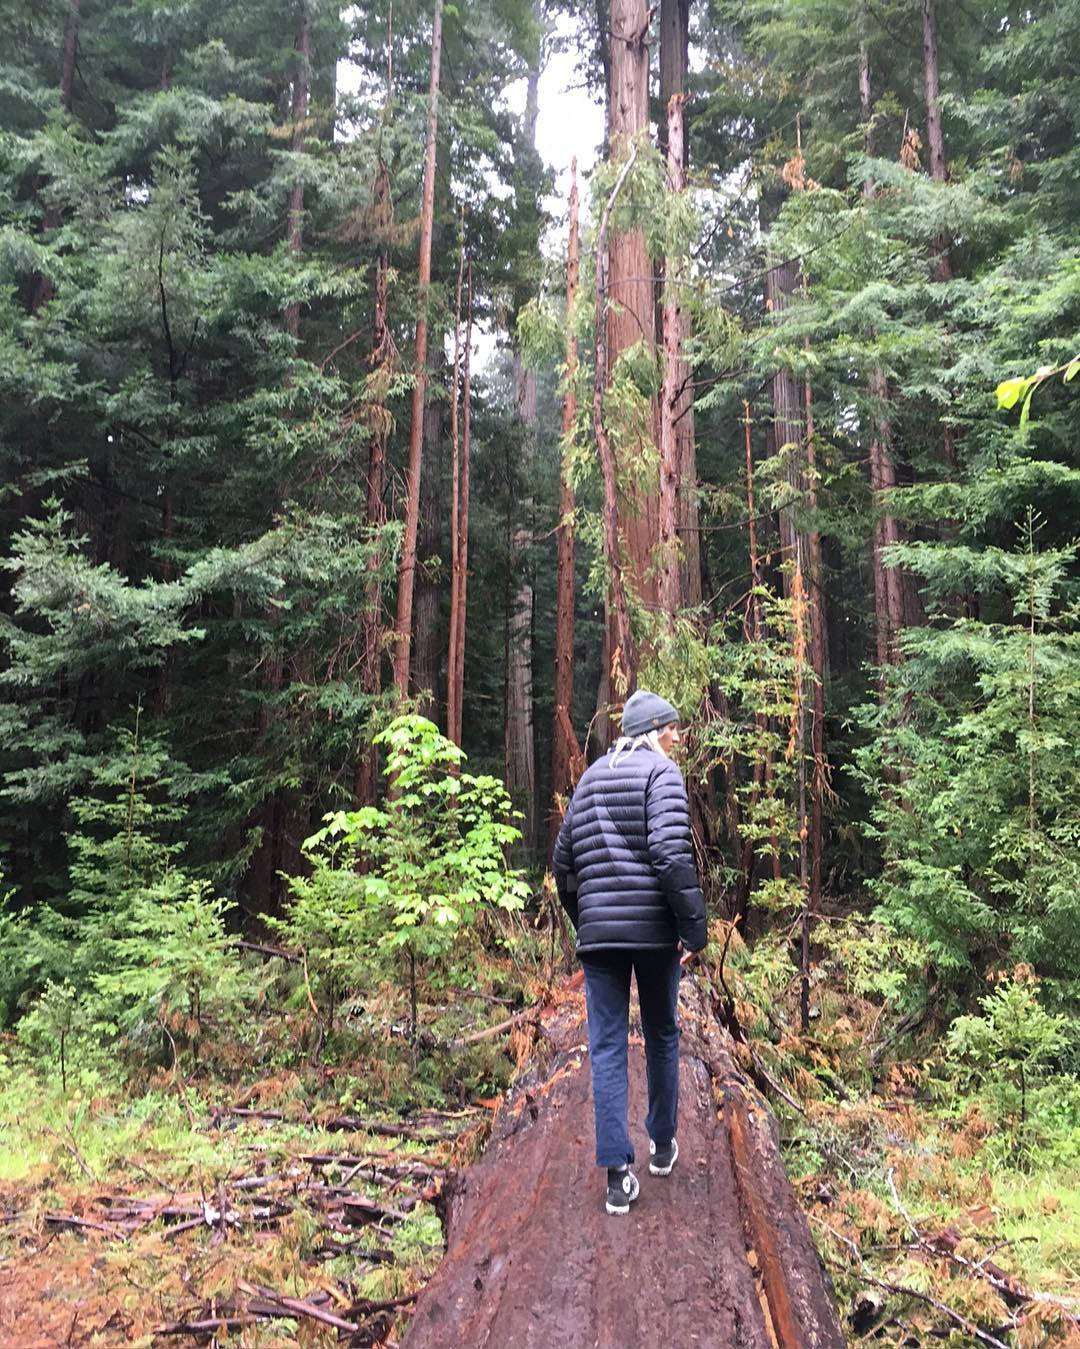 Rumor is @desireemelancon's walking from Oregon to #superpark20 as we speak. Good luck, Des!